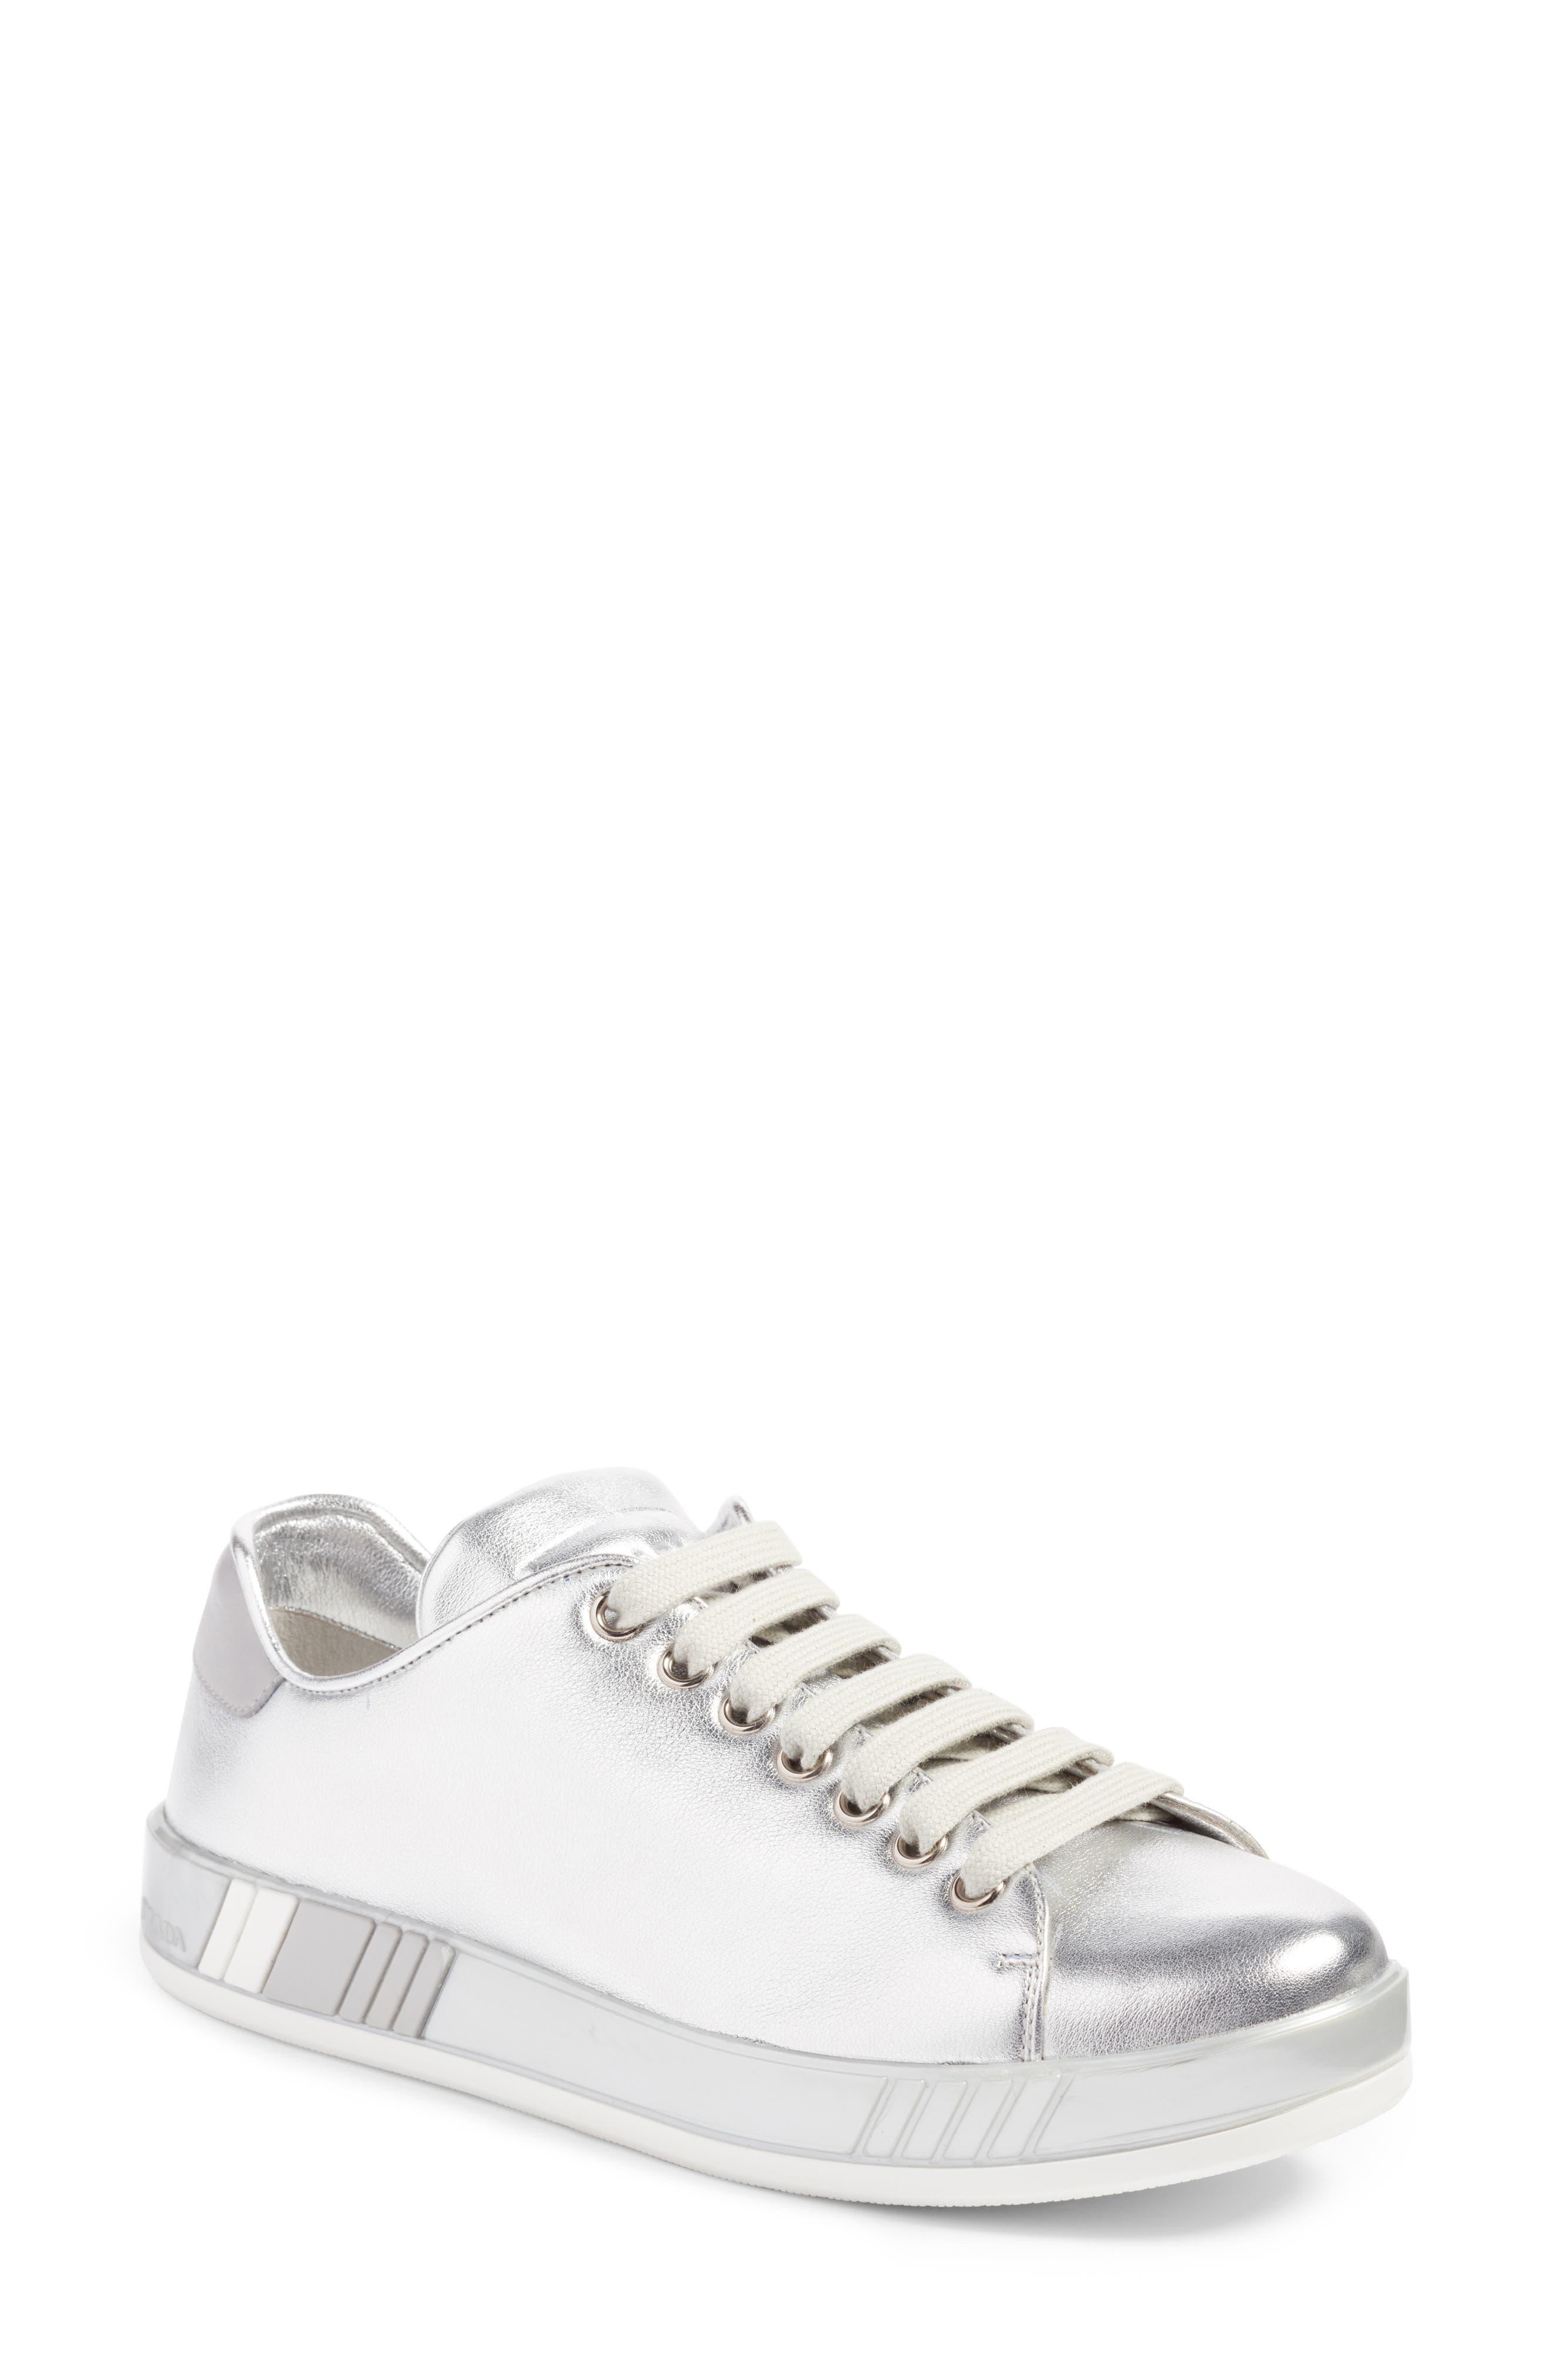 Low Top Sneaker,                             Main thumbnail 1, color,                             Metallic Silver